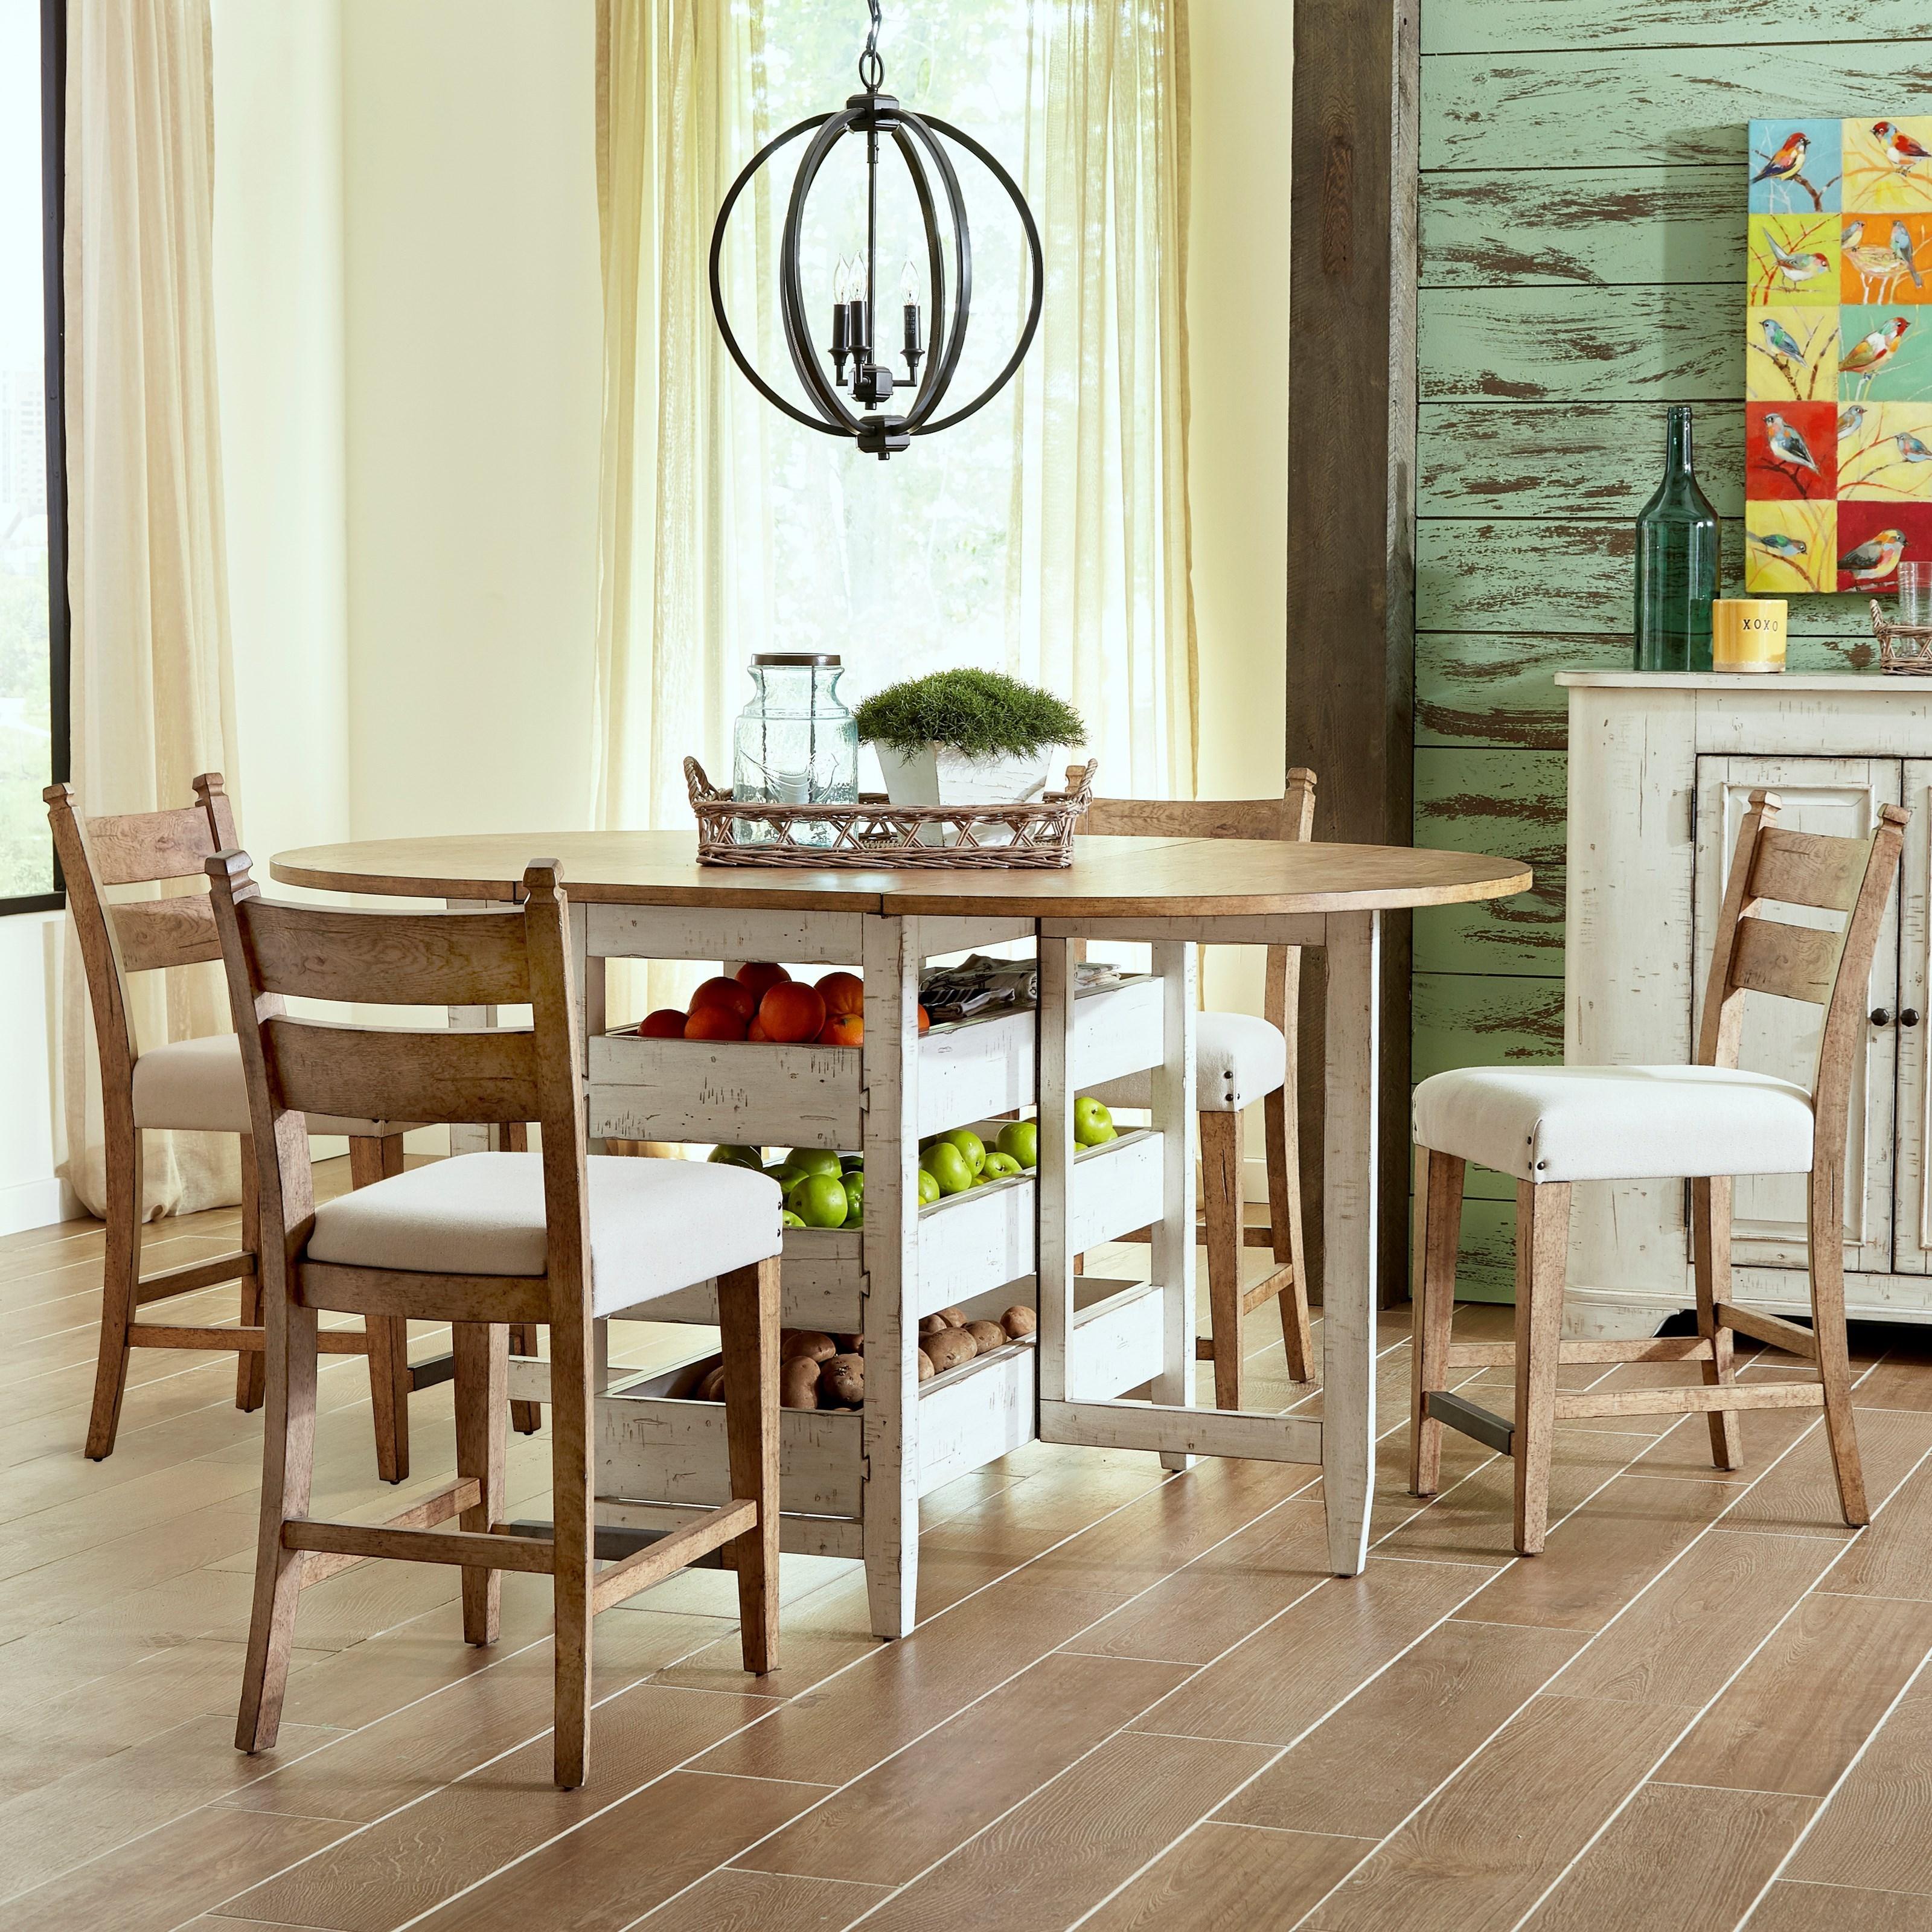 Coming Home 5 Pc Counter Gateleg Set by Trisha Yearwood Home at Belfort Furniture